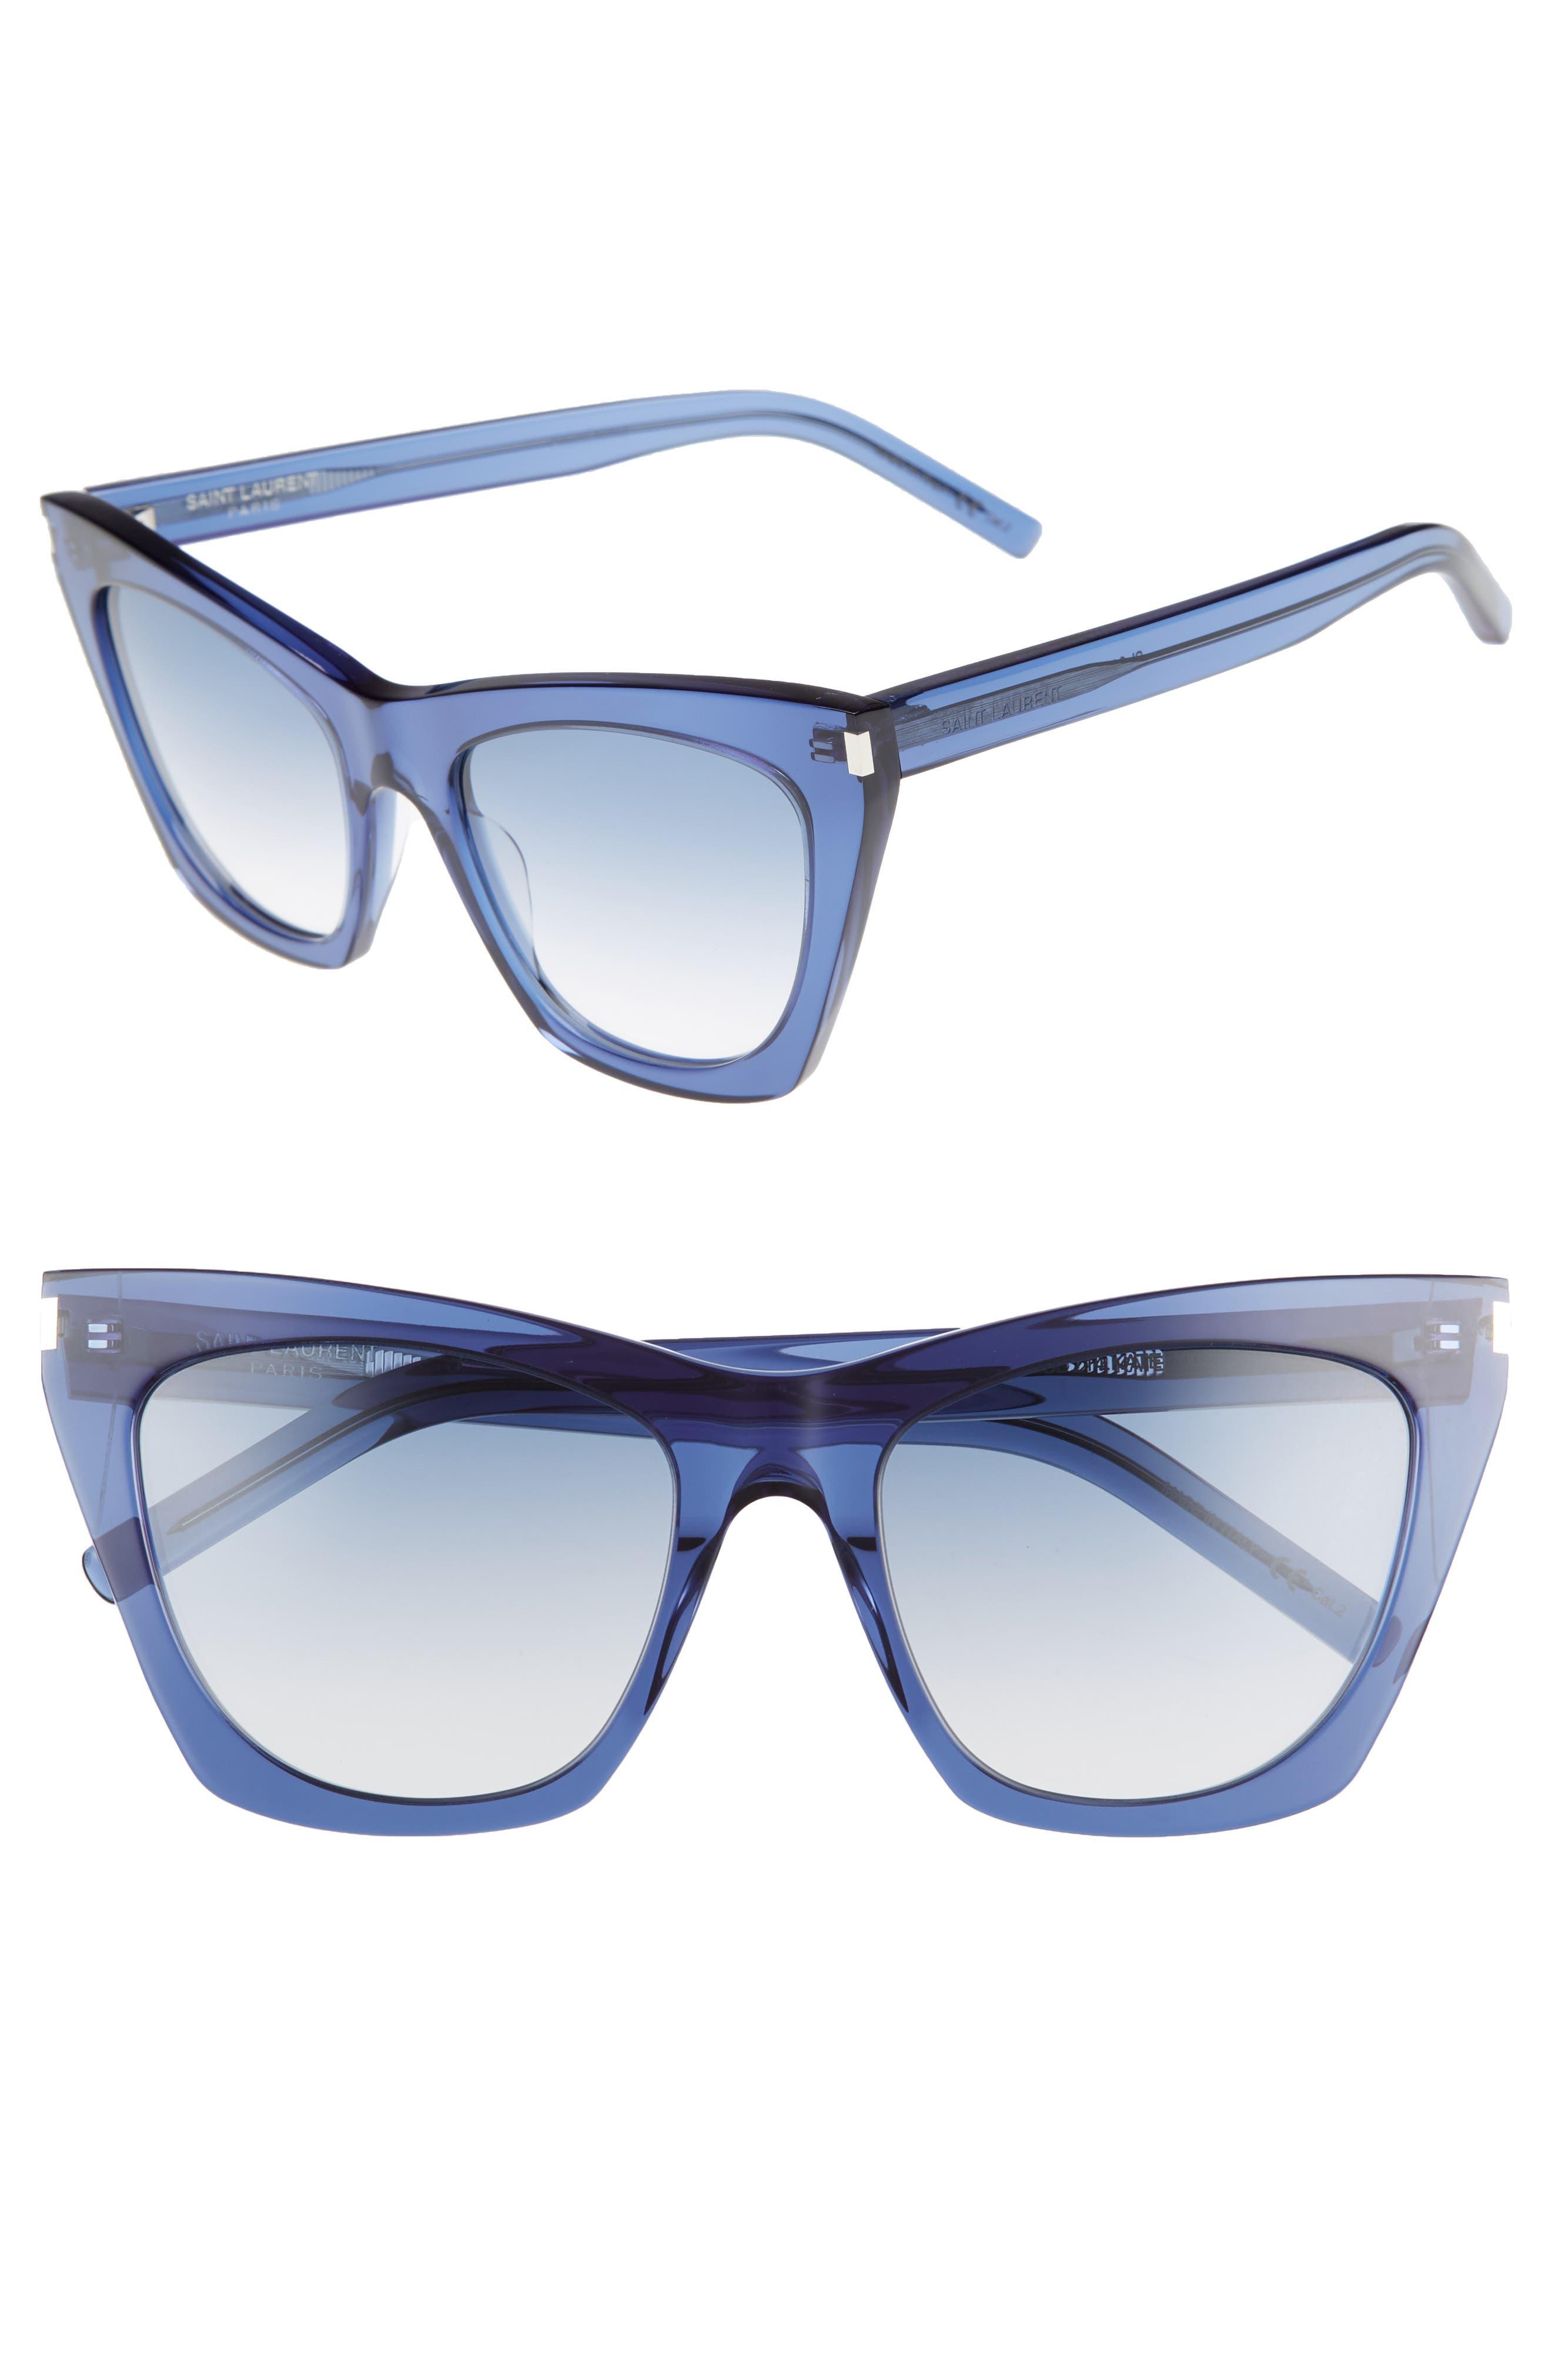 Kate 55mm Cat Eye Sunglasses,                             Main thumbnail 1, color,                             Blue